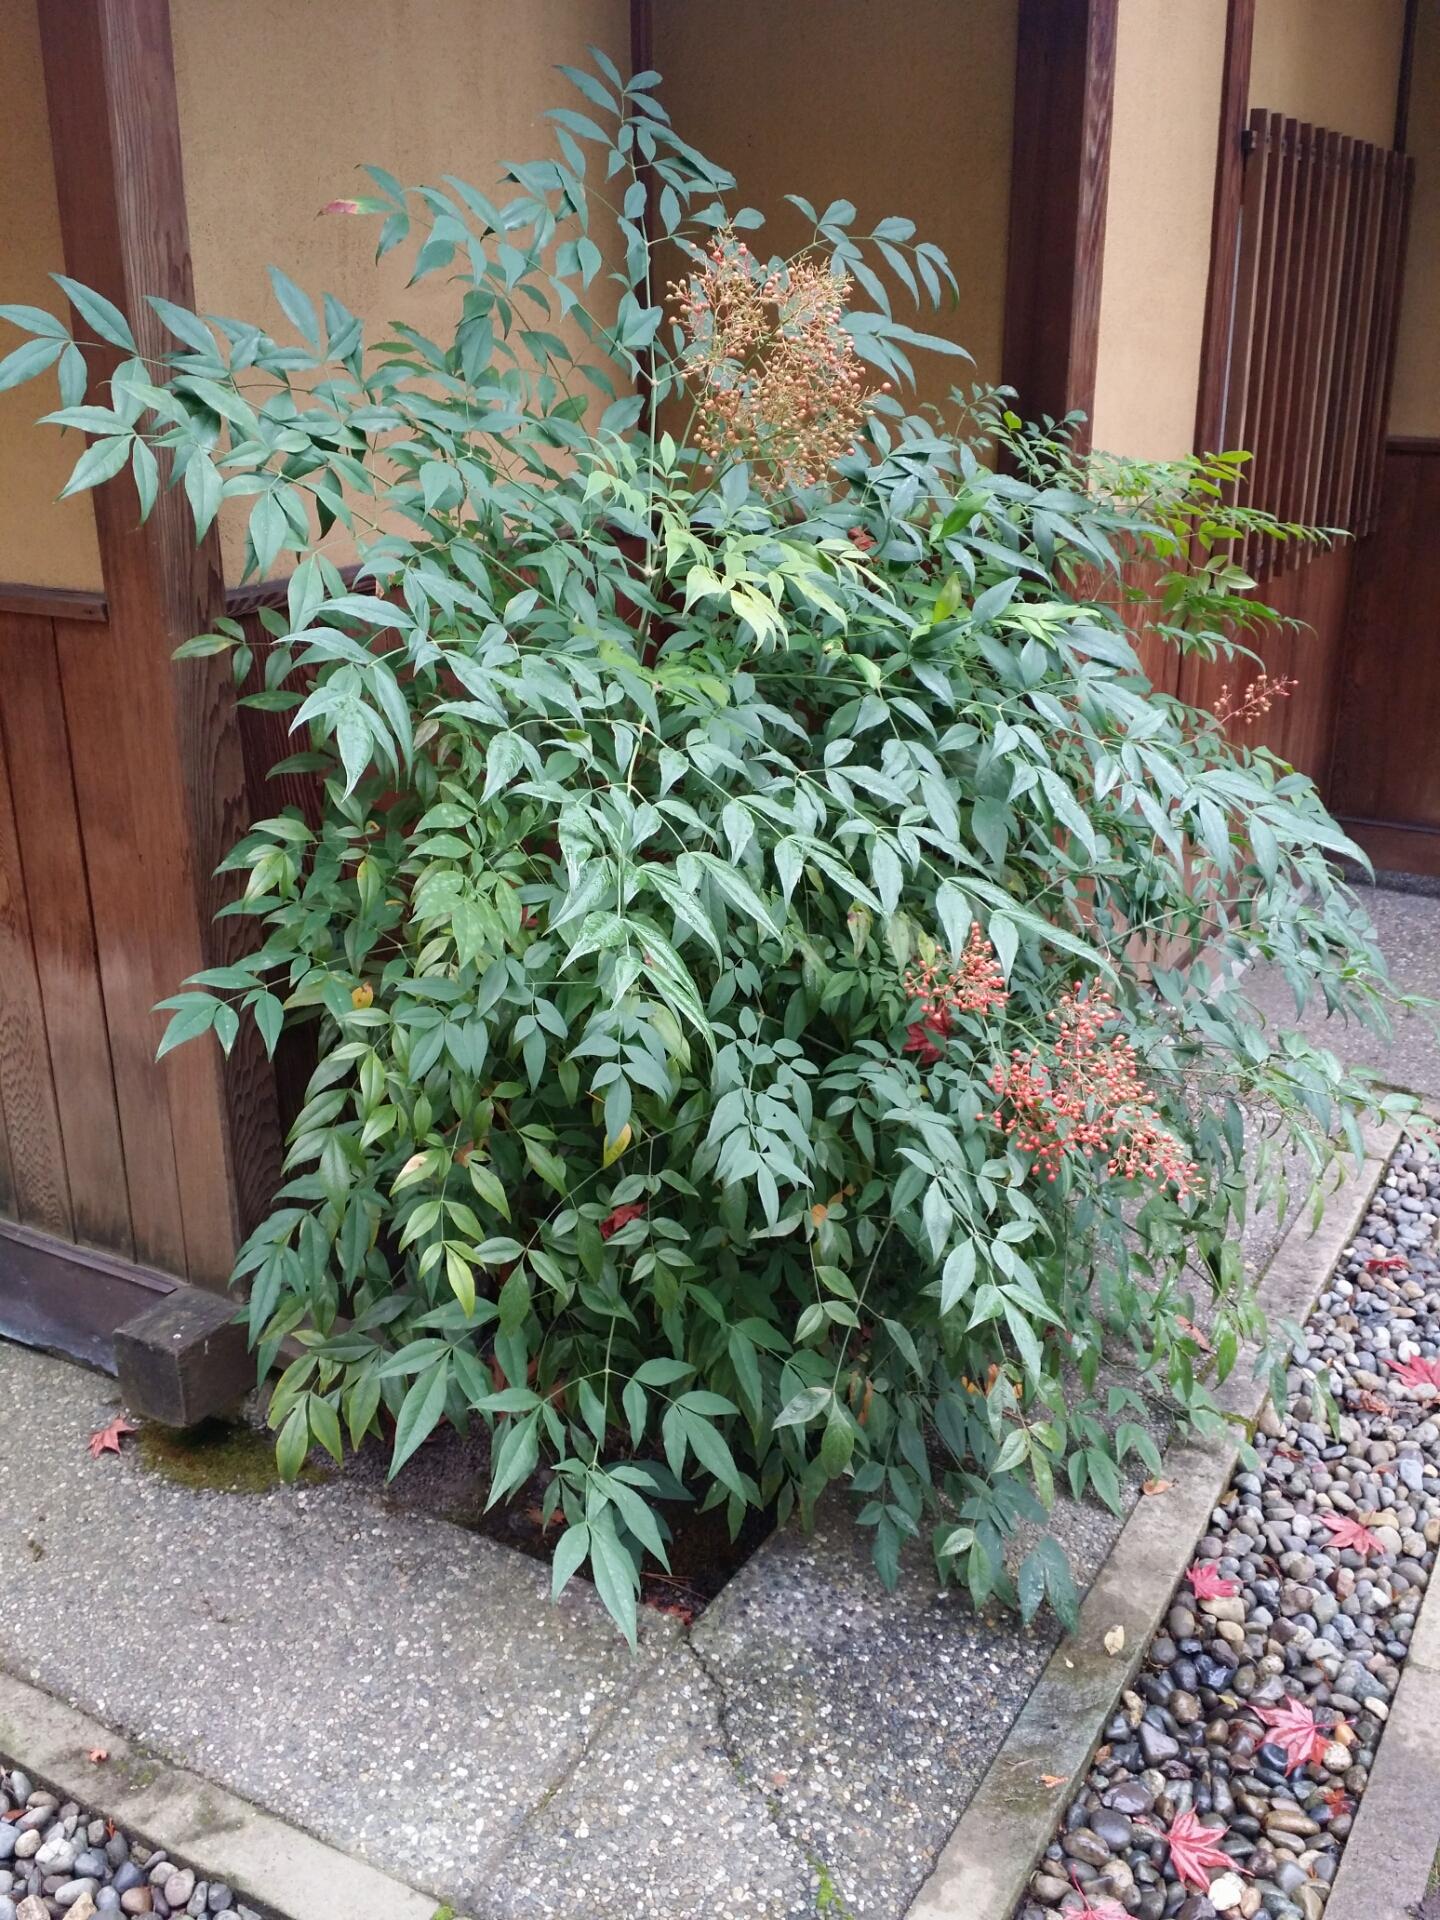 Nandina domestica , known as heavenly bamboo